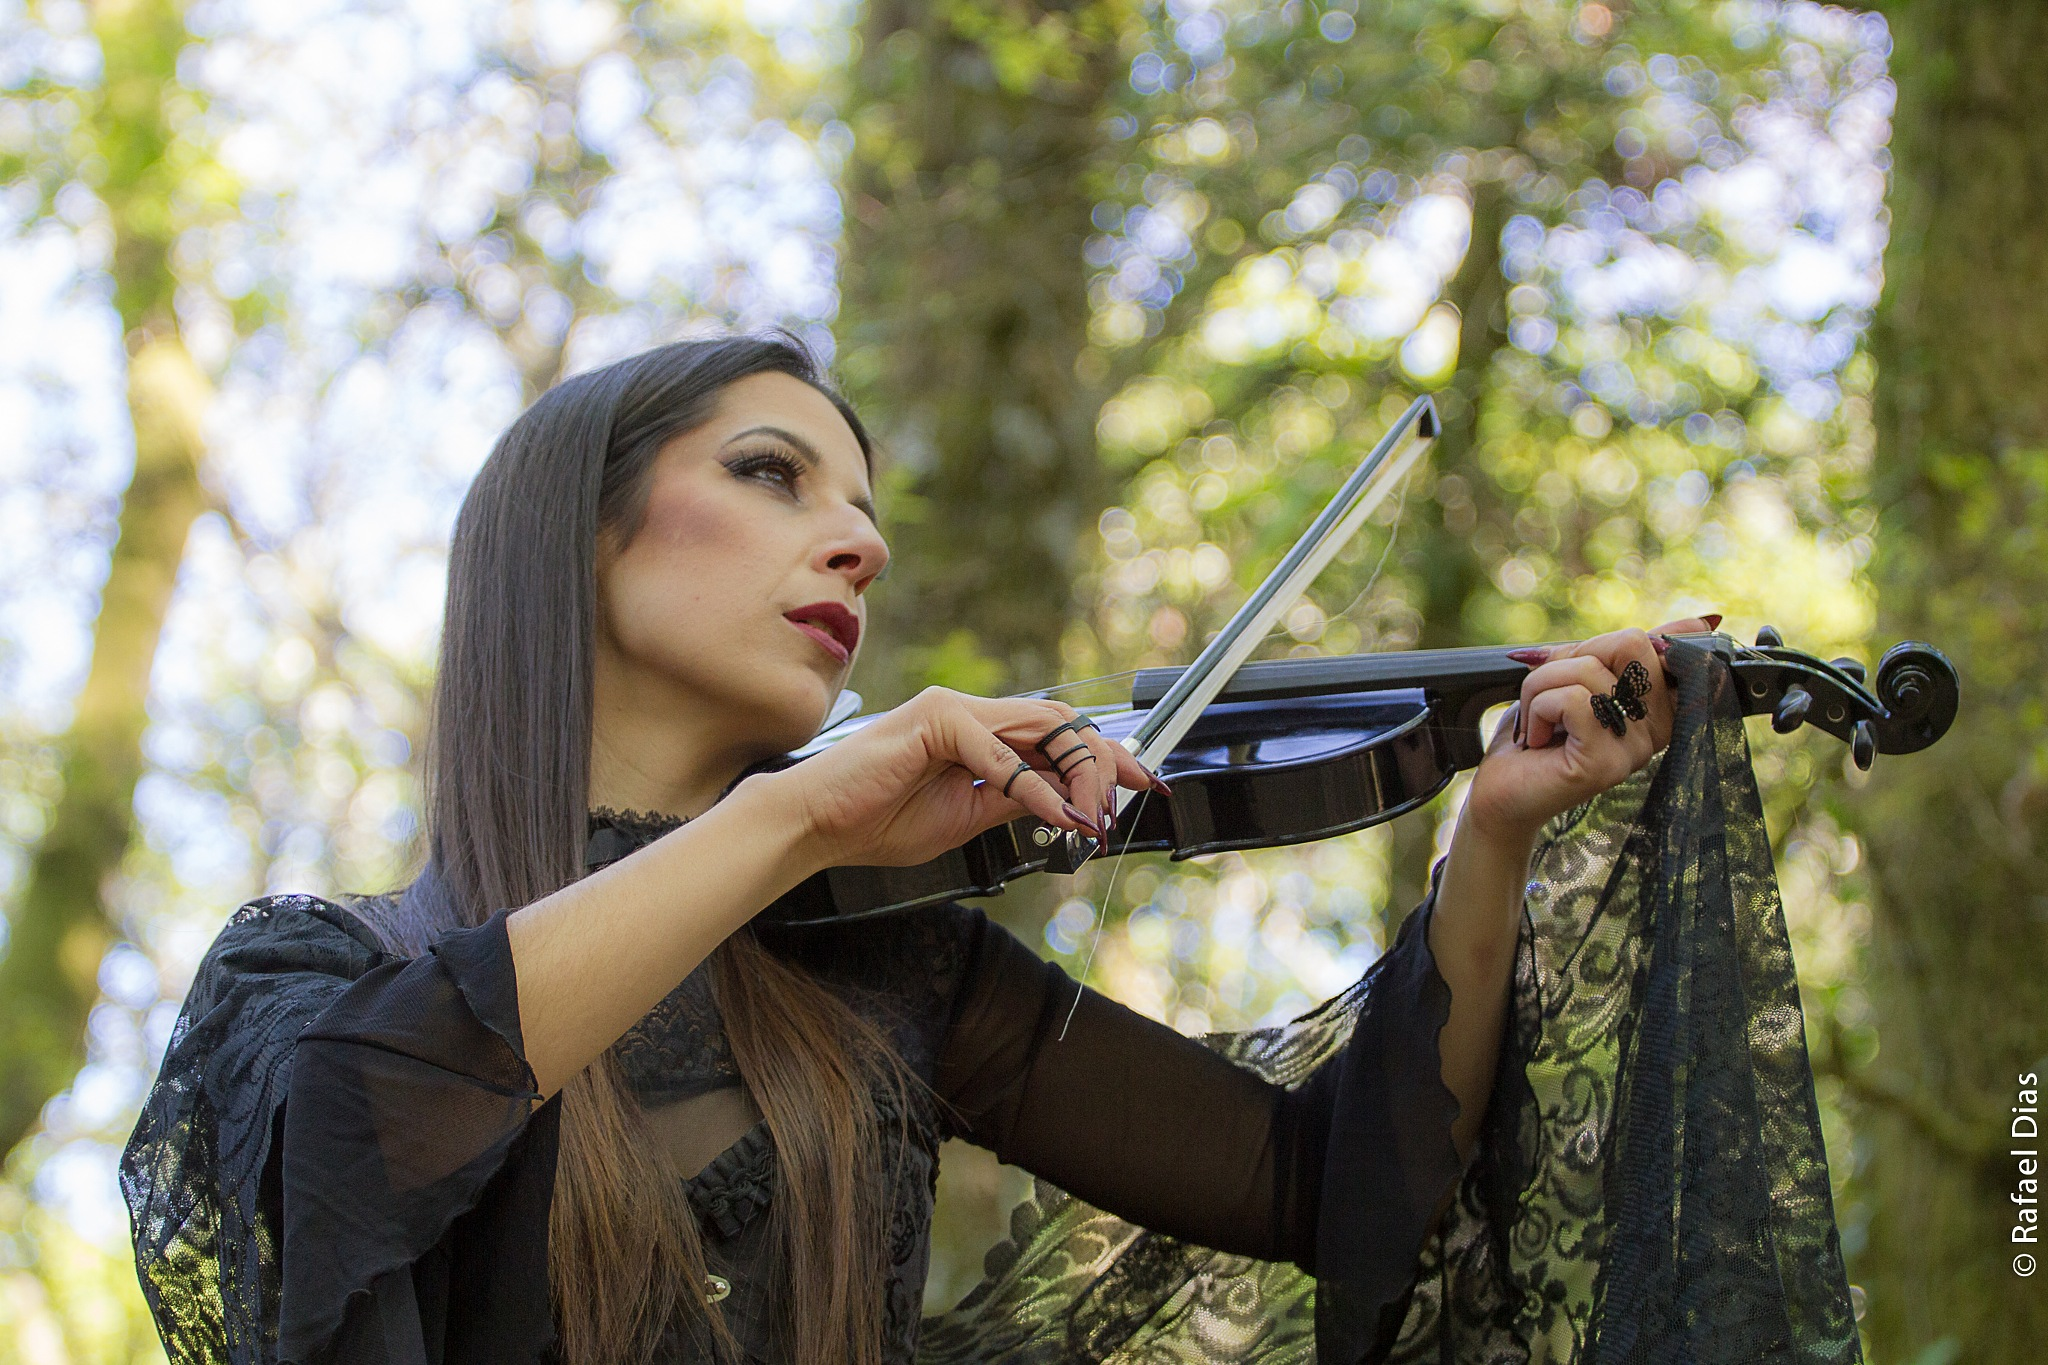 Playing the Violin by Rafael Dias